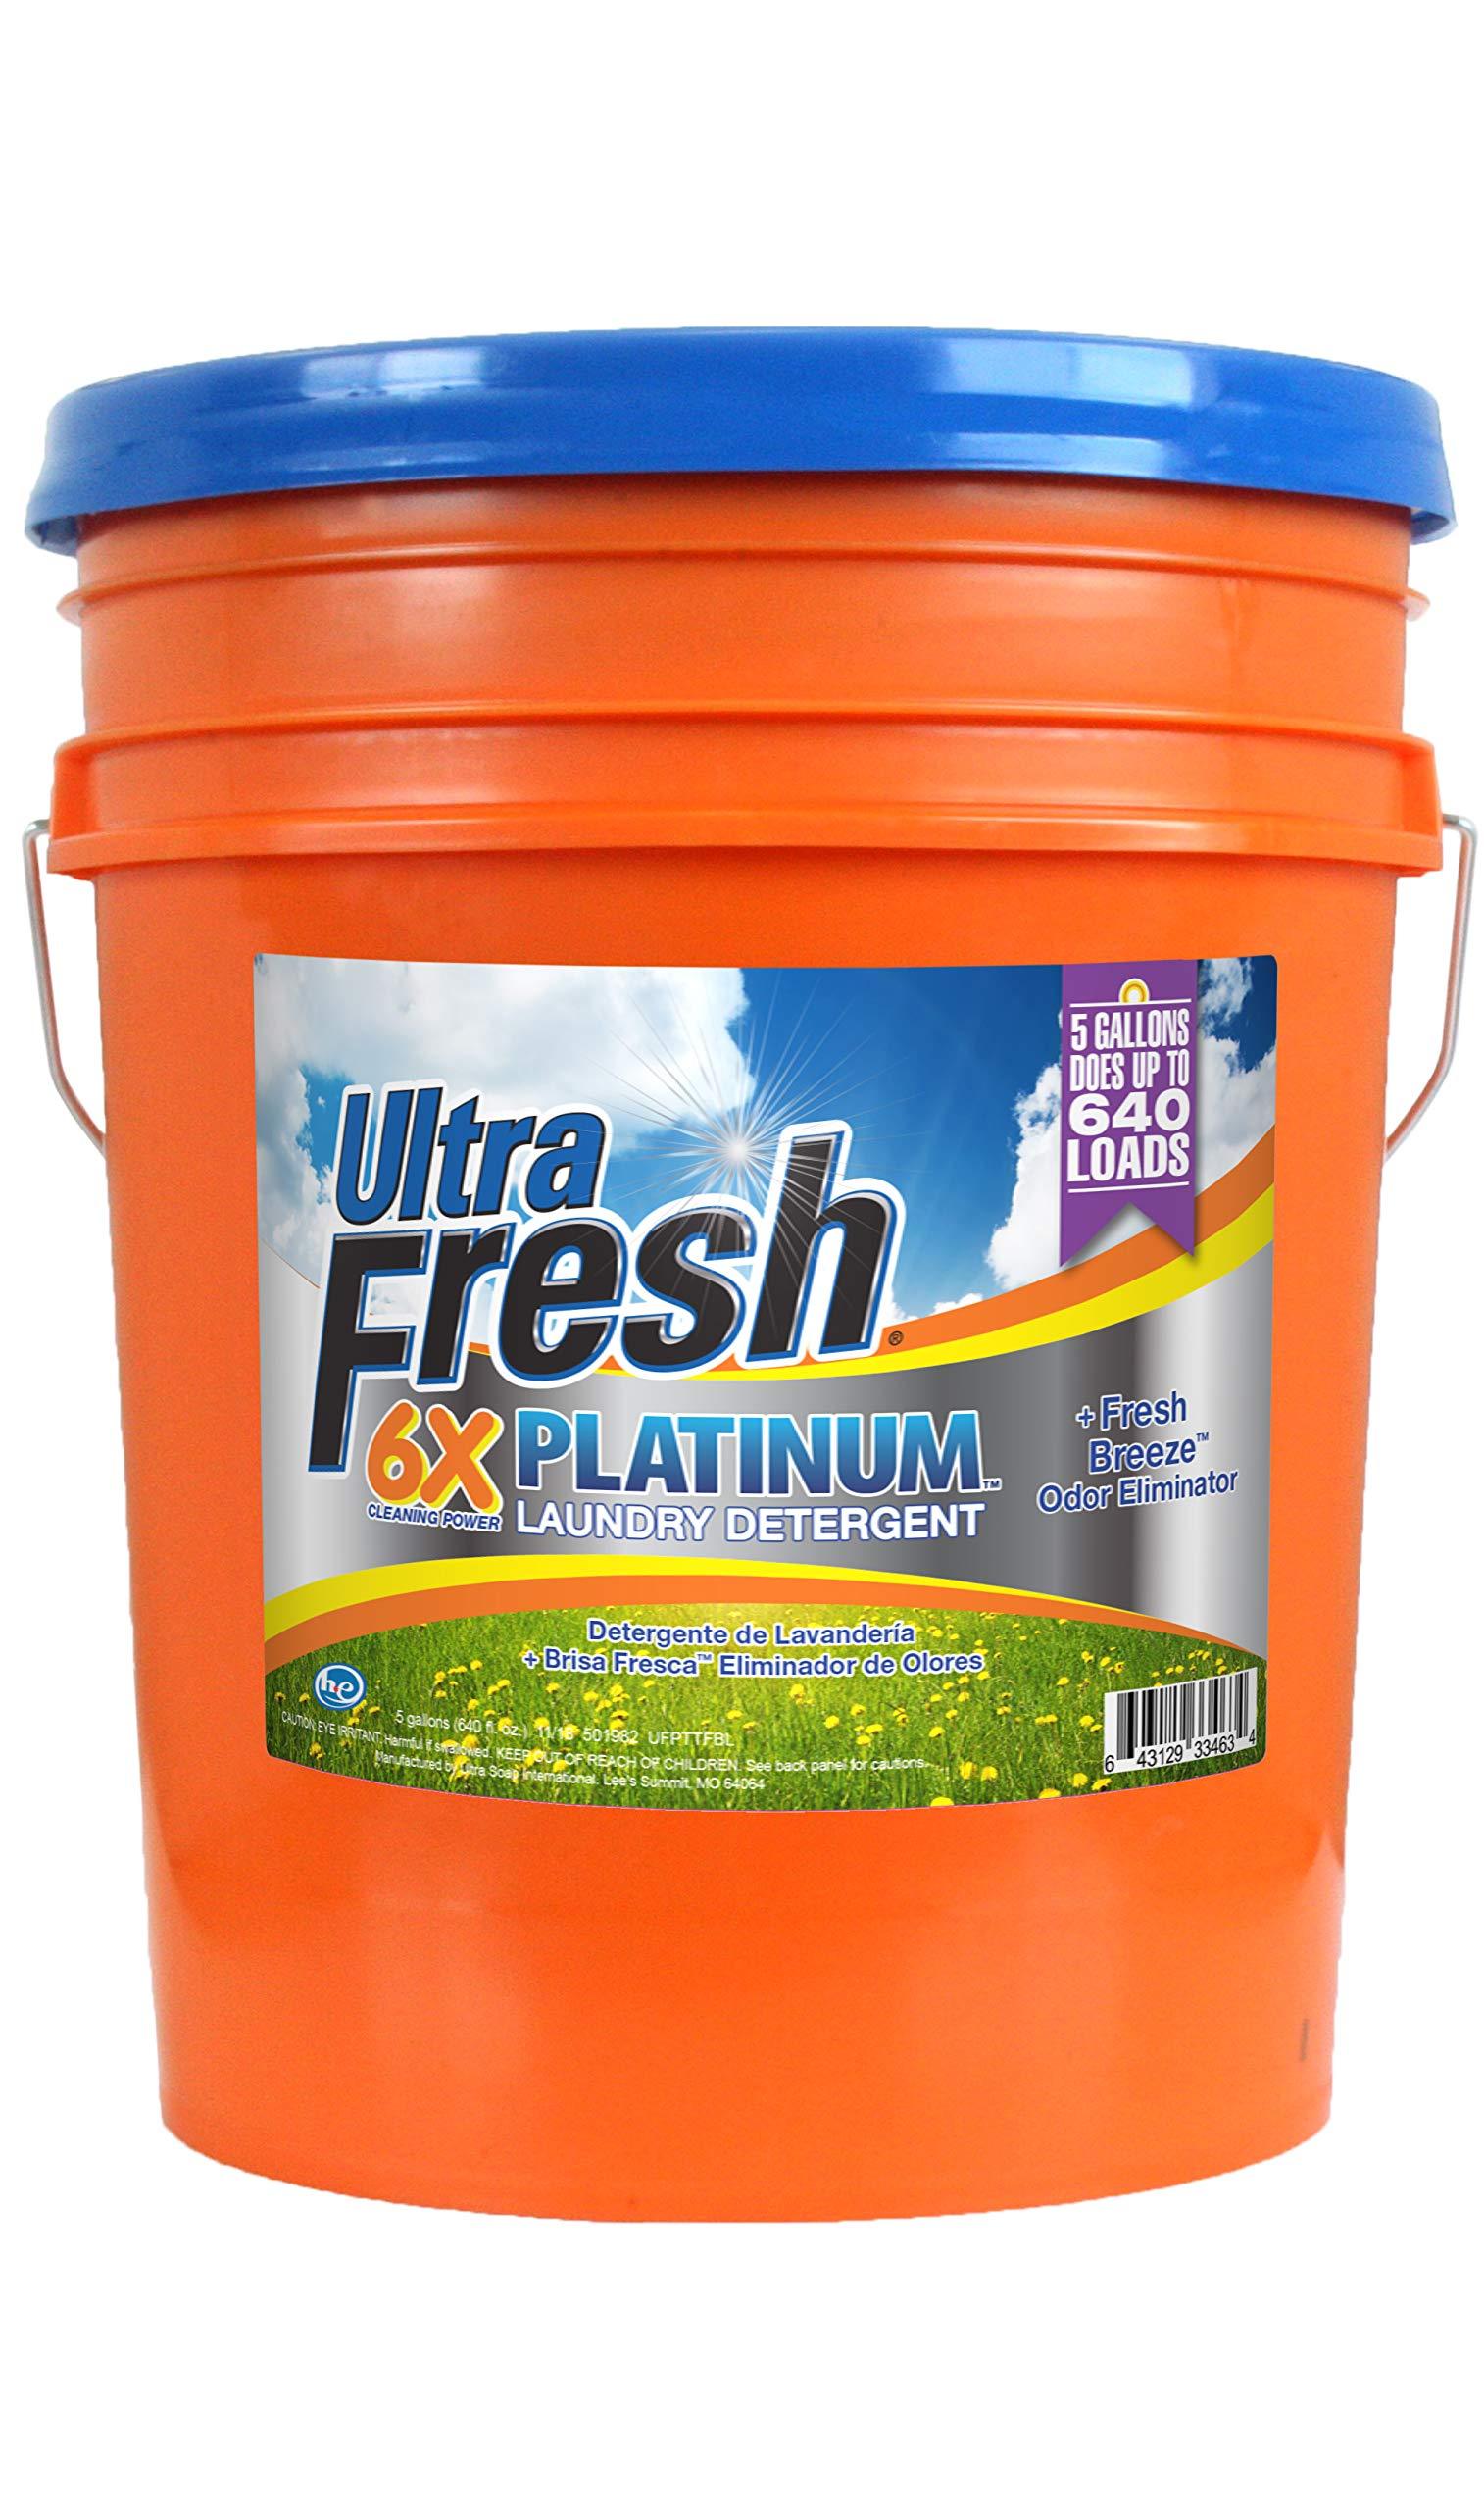 Ultra Fresh UFPTTFBL Platinum Fresh Breeze Liquid Laundry Detergent, HE, 5 gal, 640 oz.